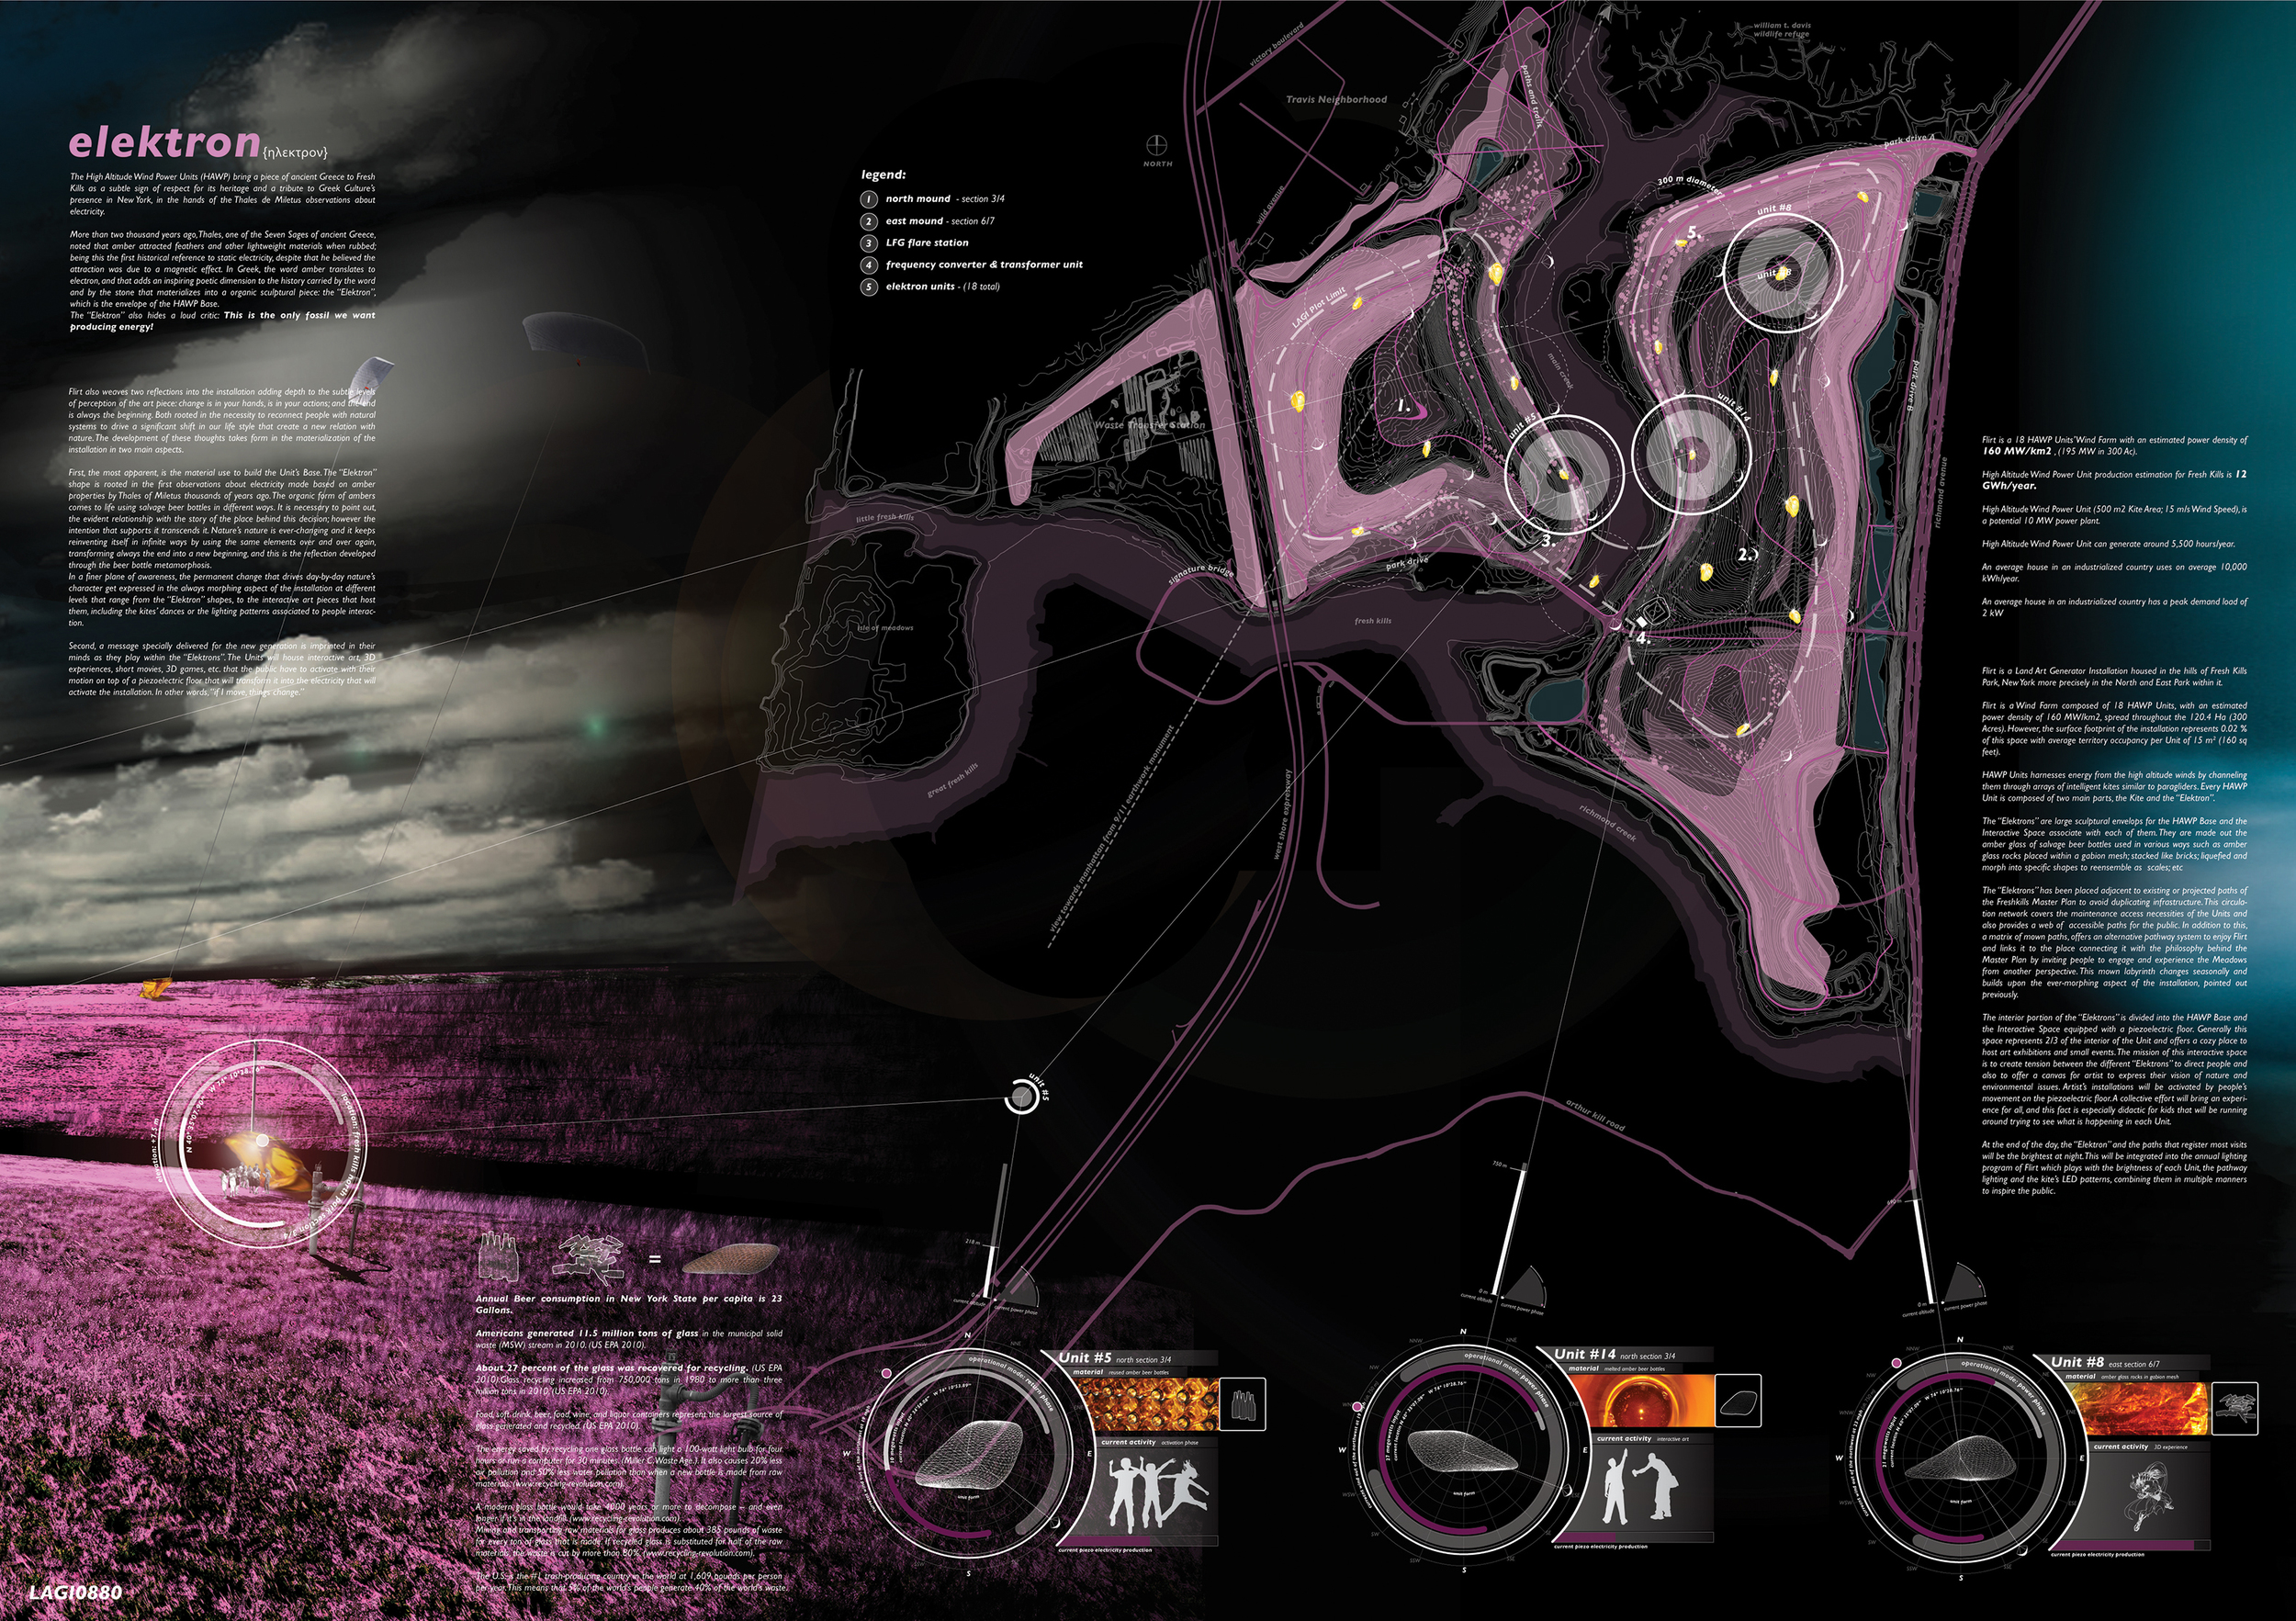 20120630_Electron.jpg